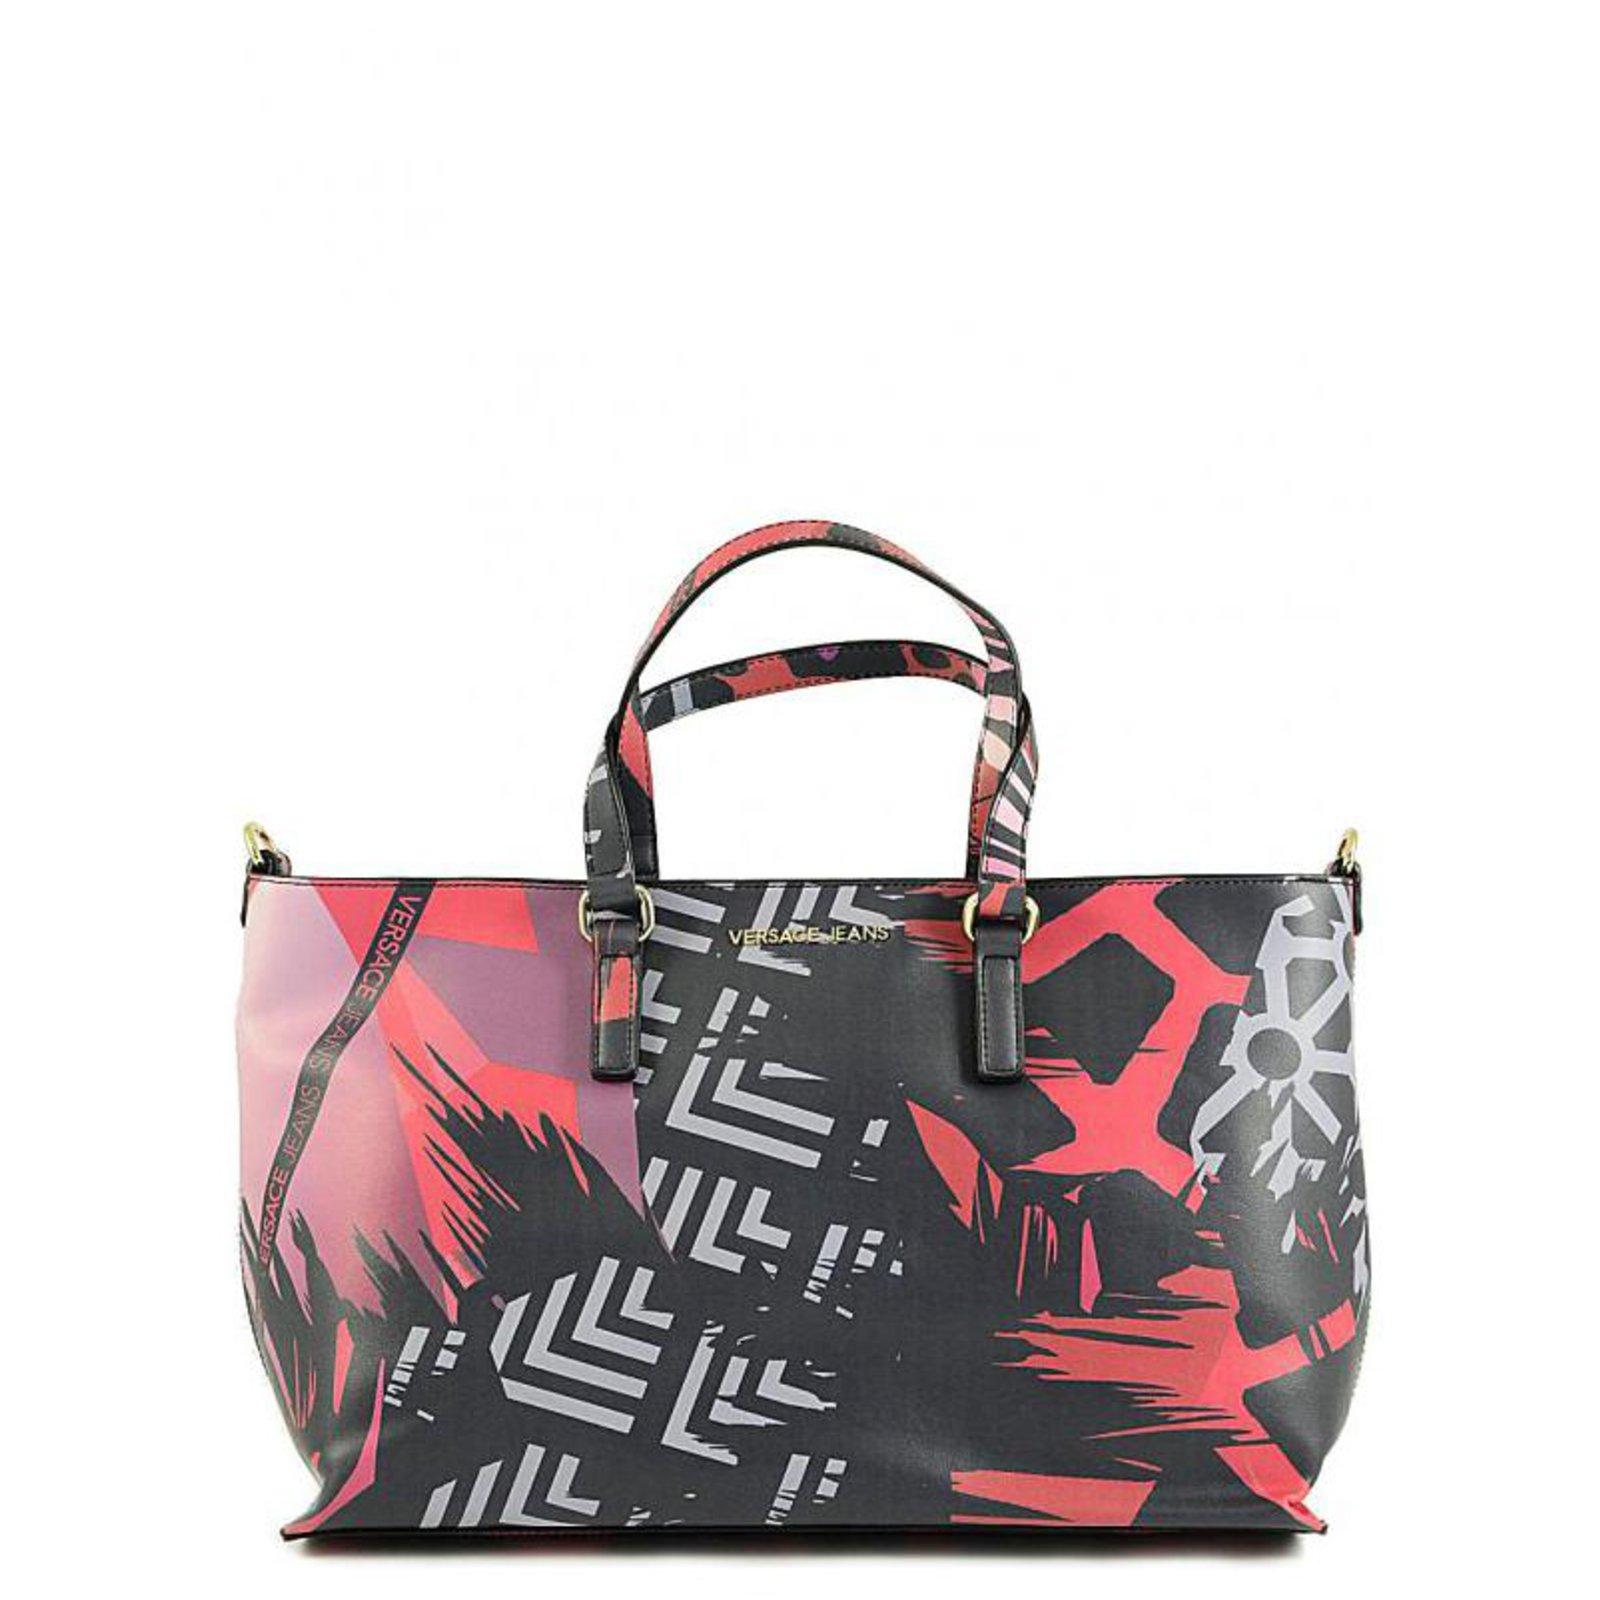 3962cdef3e Versace Versace Jeans handbag new Handbags Polyester Other ref.123629